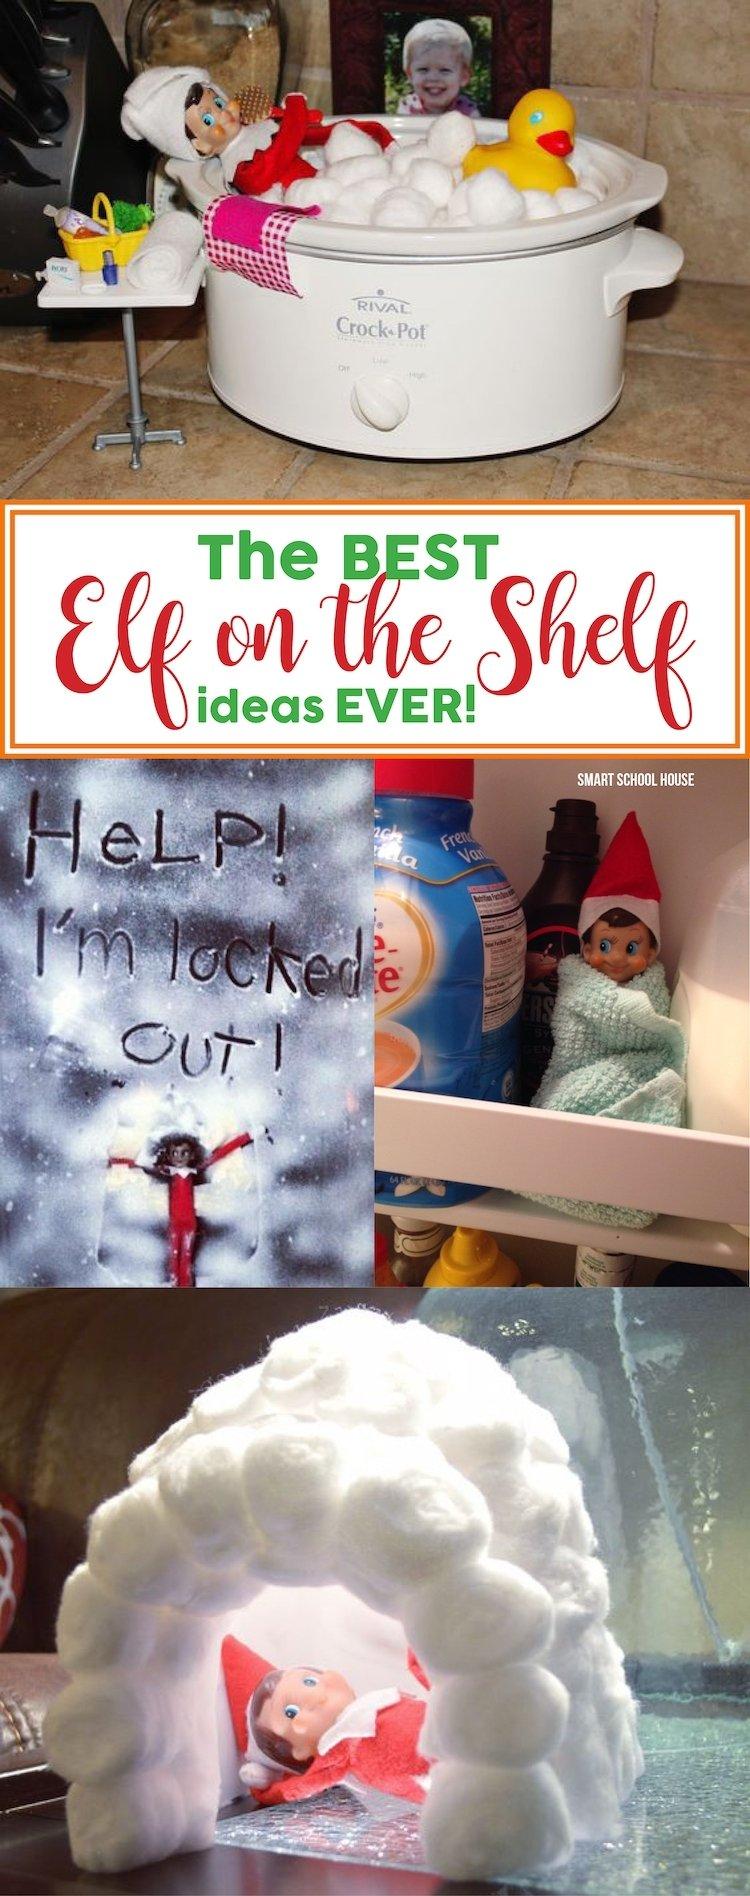 10 Most Popular Best Elf On A Shelf Ideas the best elf on the shelf ideas ever smart school house 2020